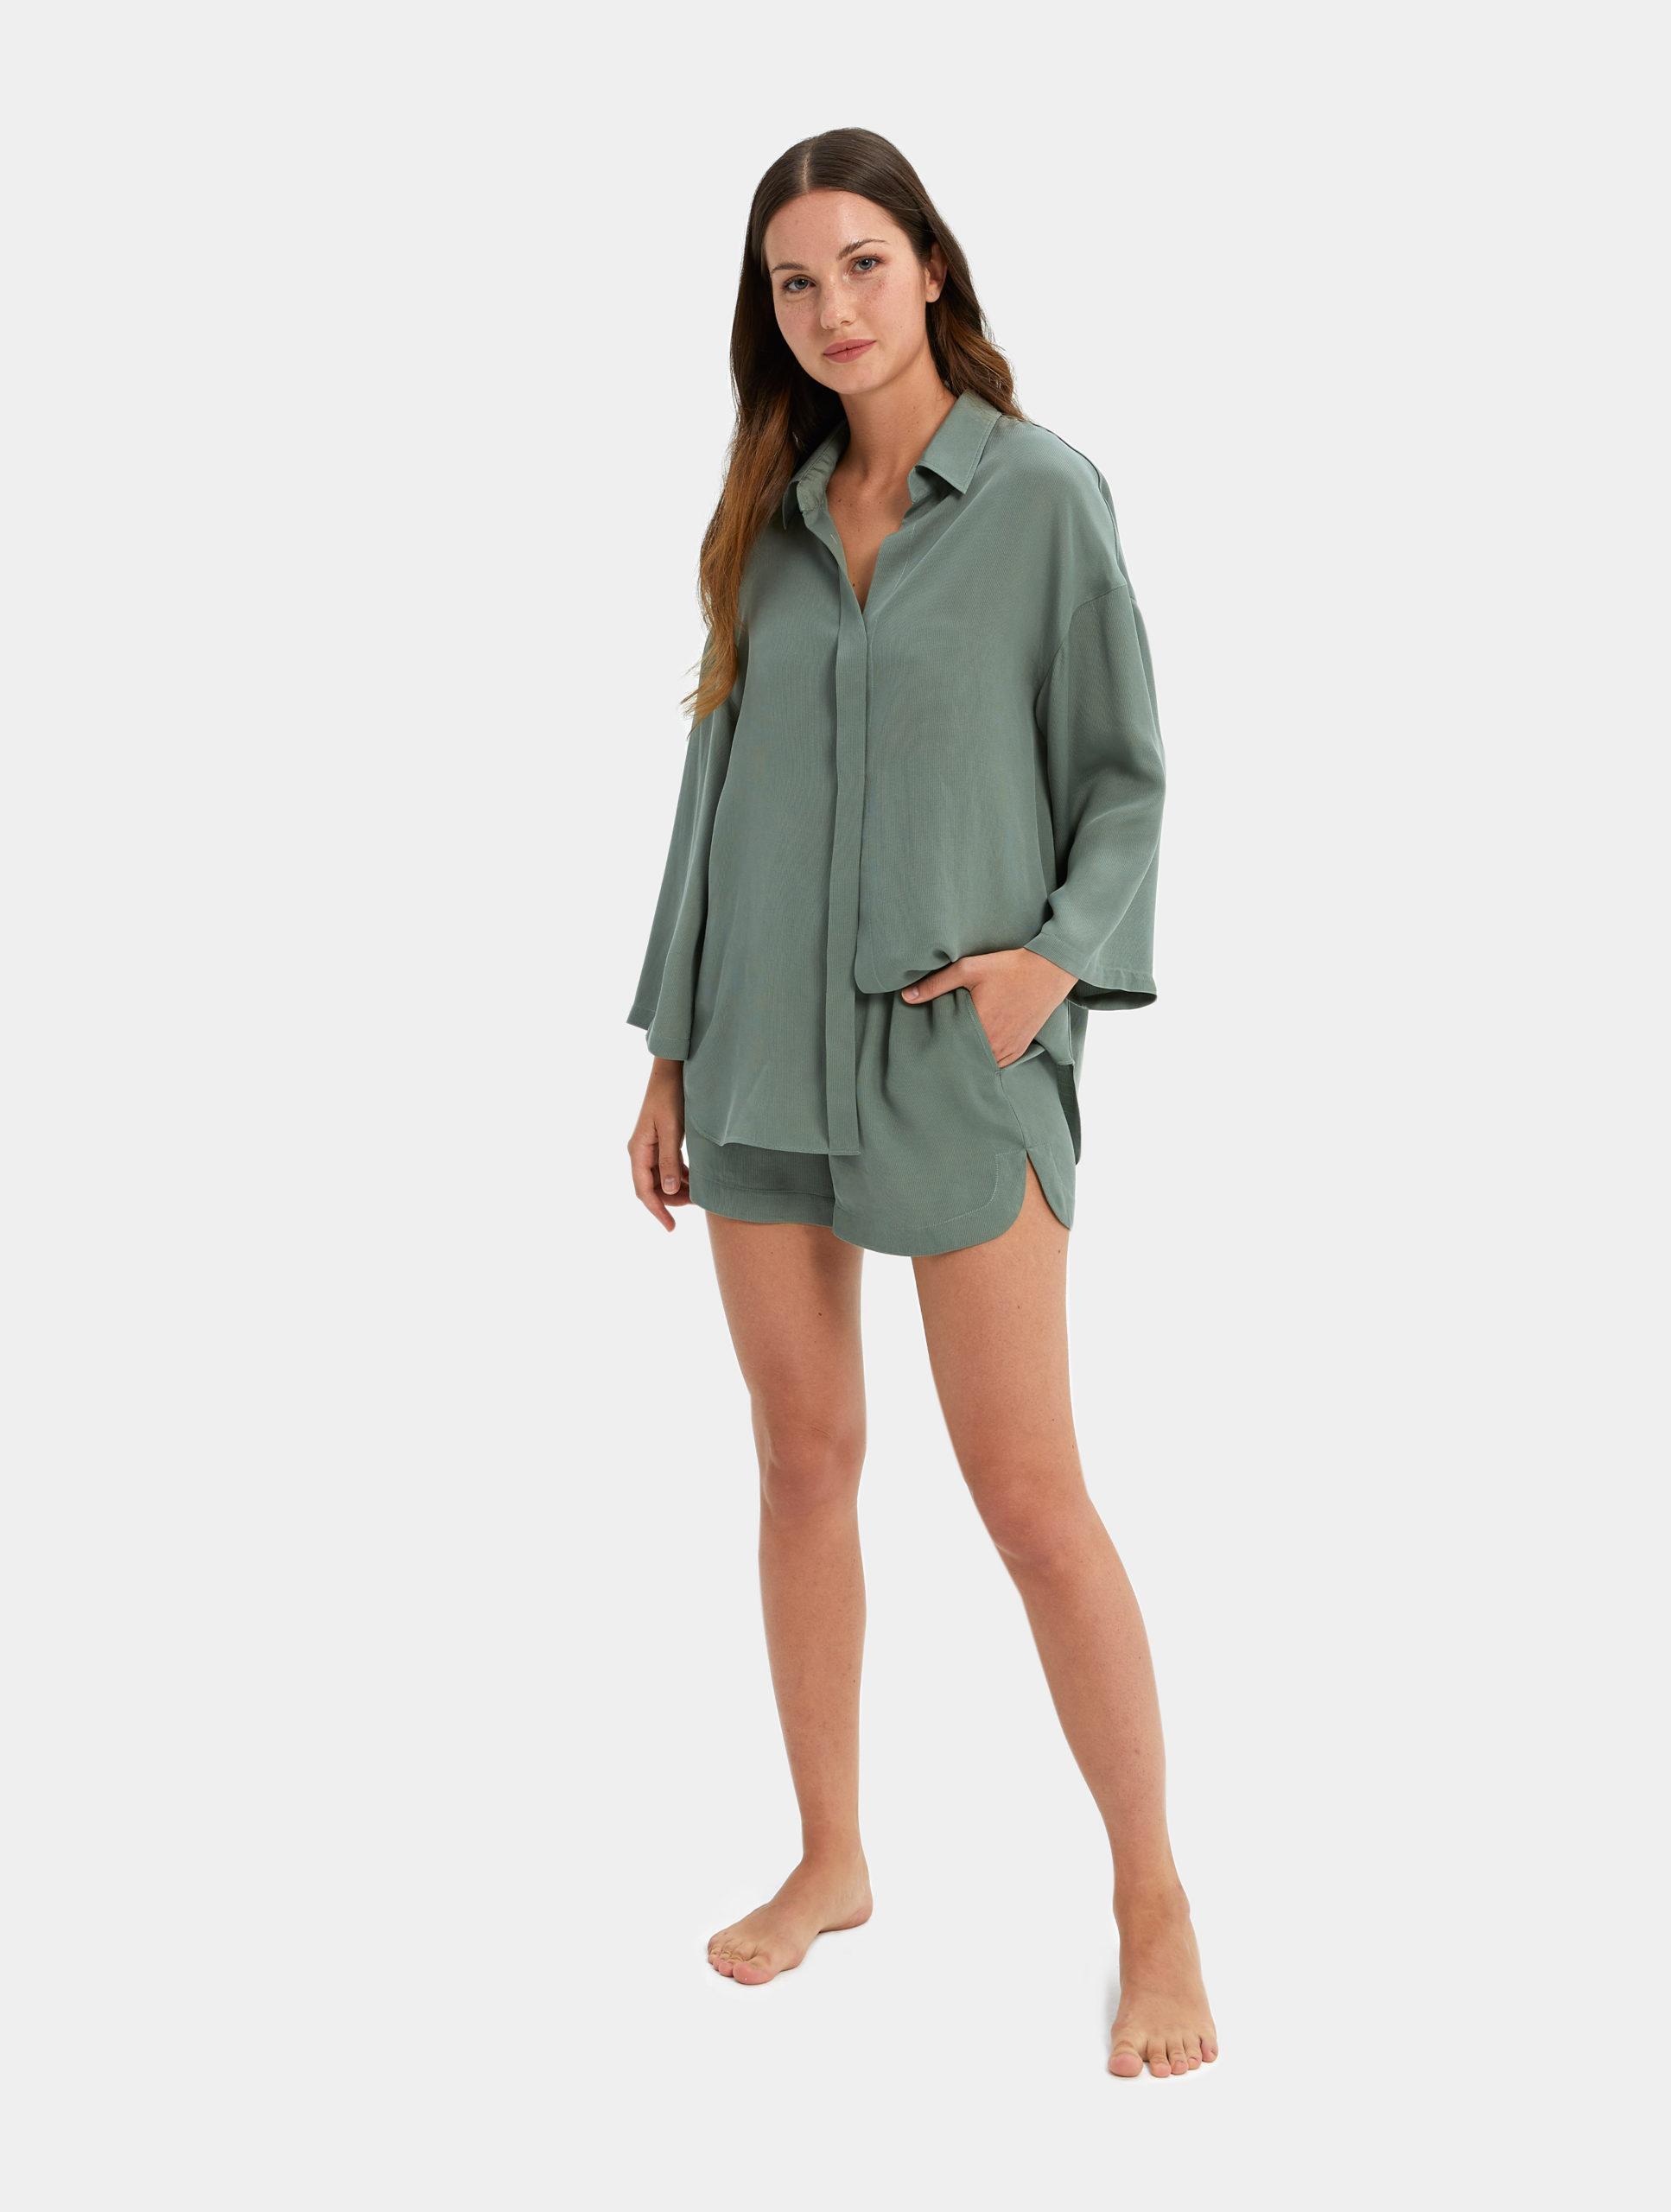 Turn Down Shirt Set - Sleepwear for the Modern Woman